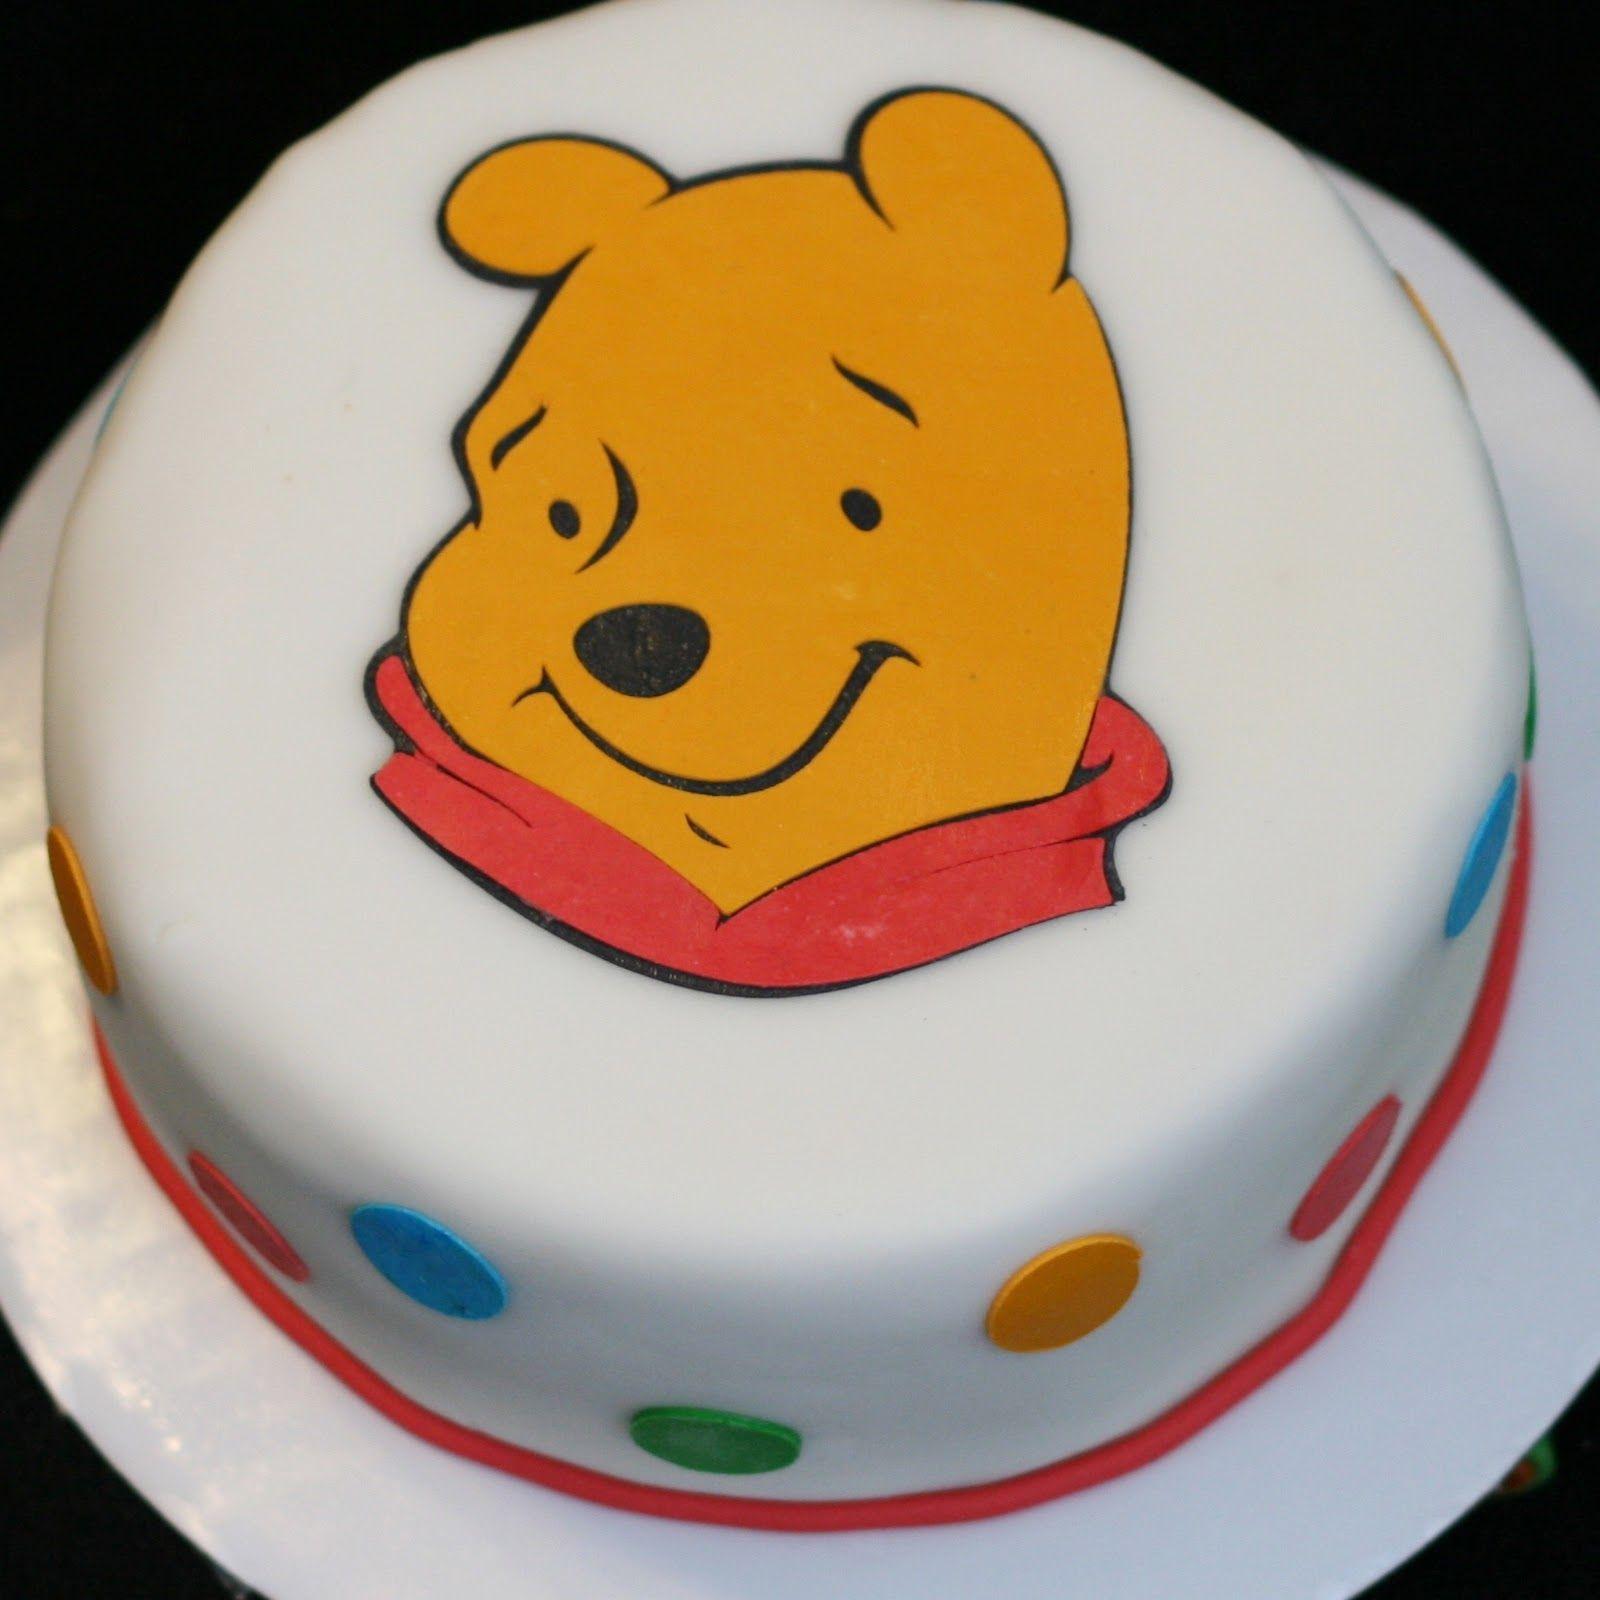 Winnie The Pooh Cakes Decoration Ideas Little Birthday Cakes Winnie The Pooh Cake Cake Birthday Cake Kids